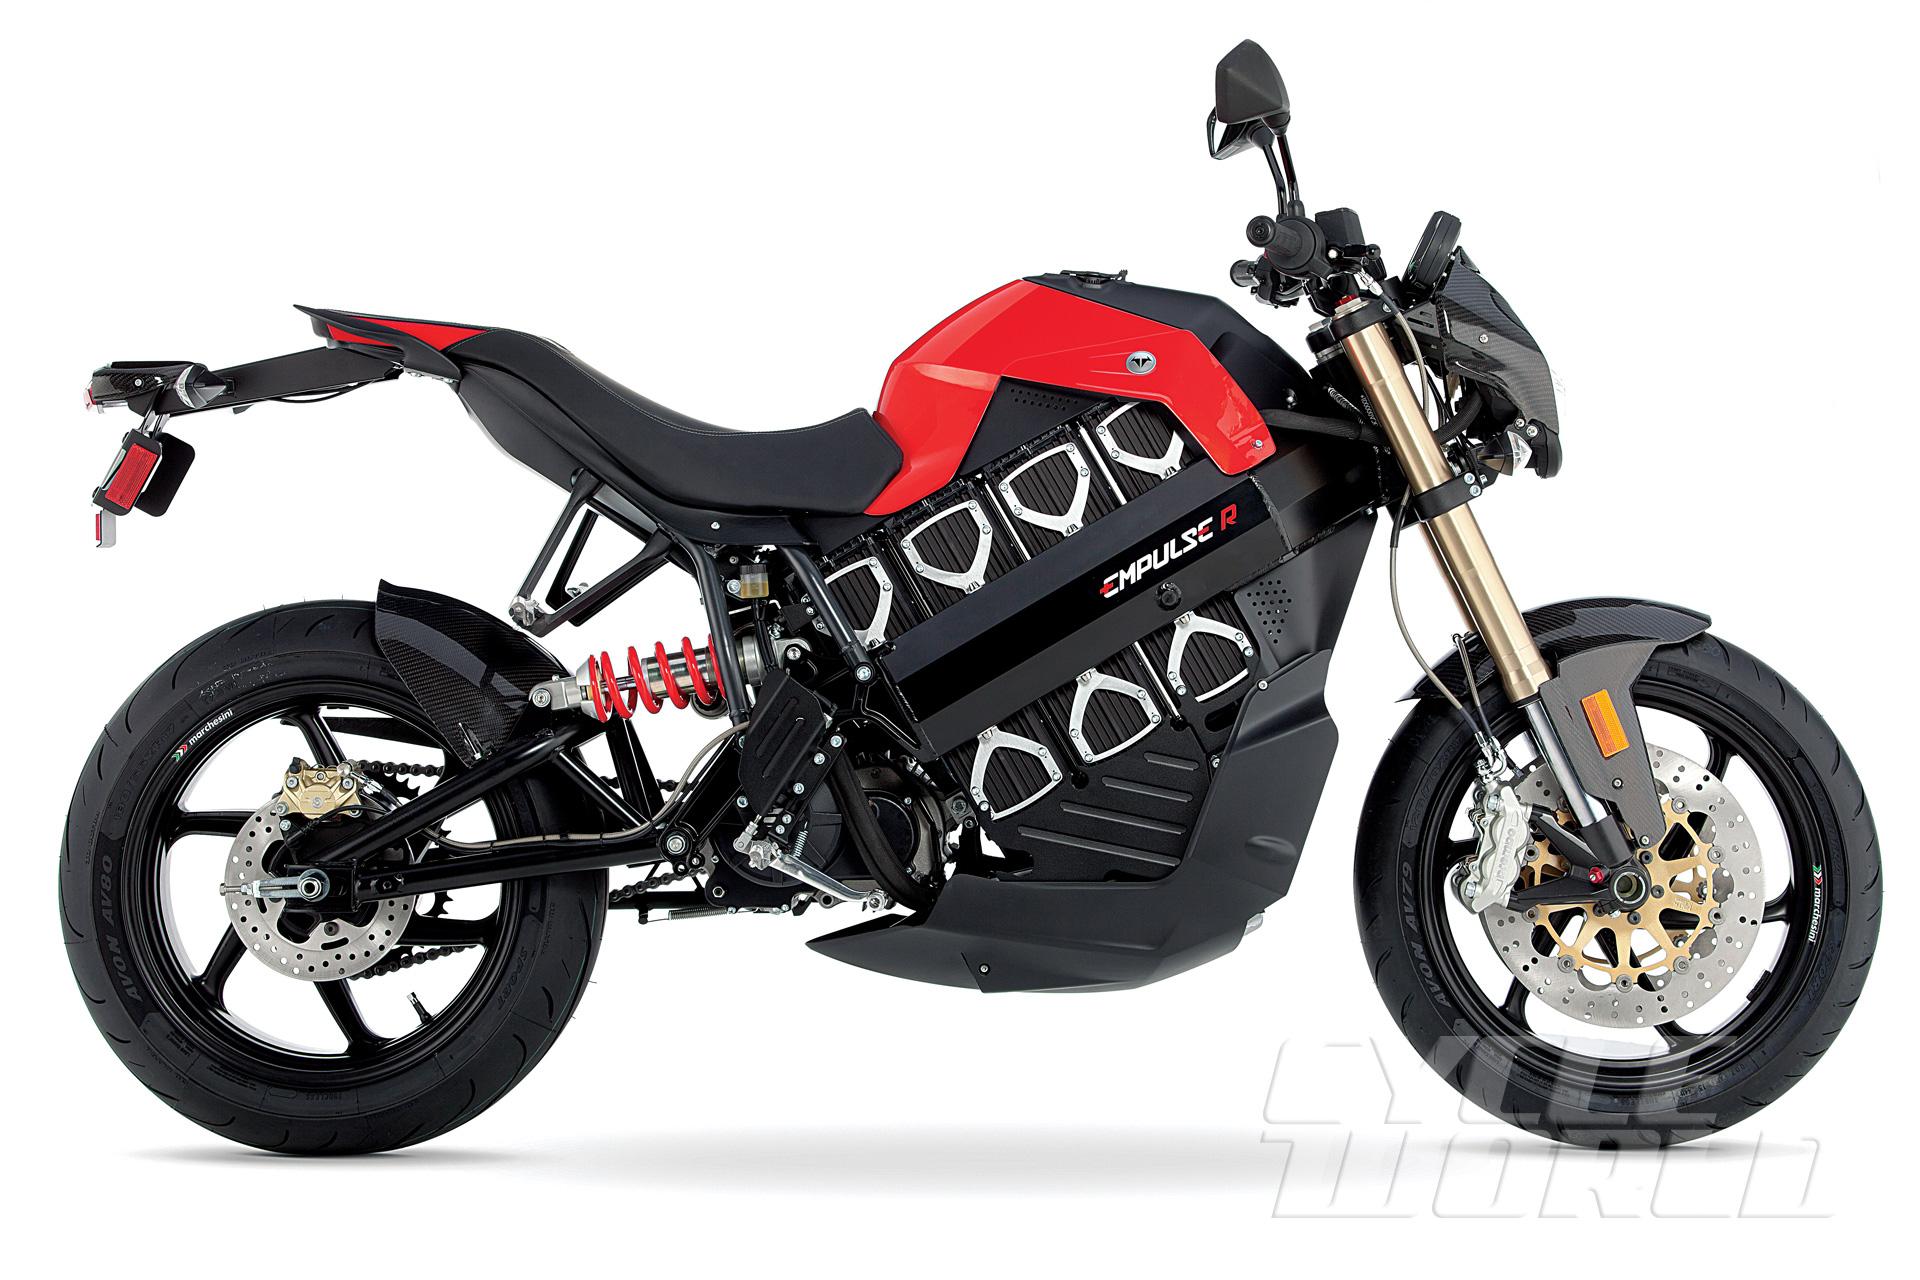 Brammo Empulse R Vs Zero S Electric Motorcycle Comparison Review